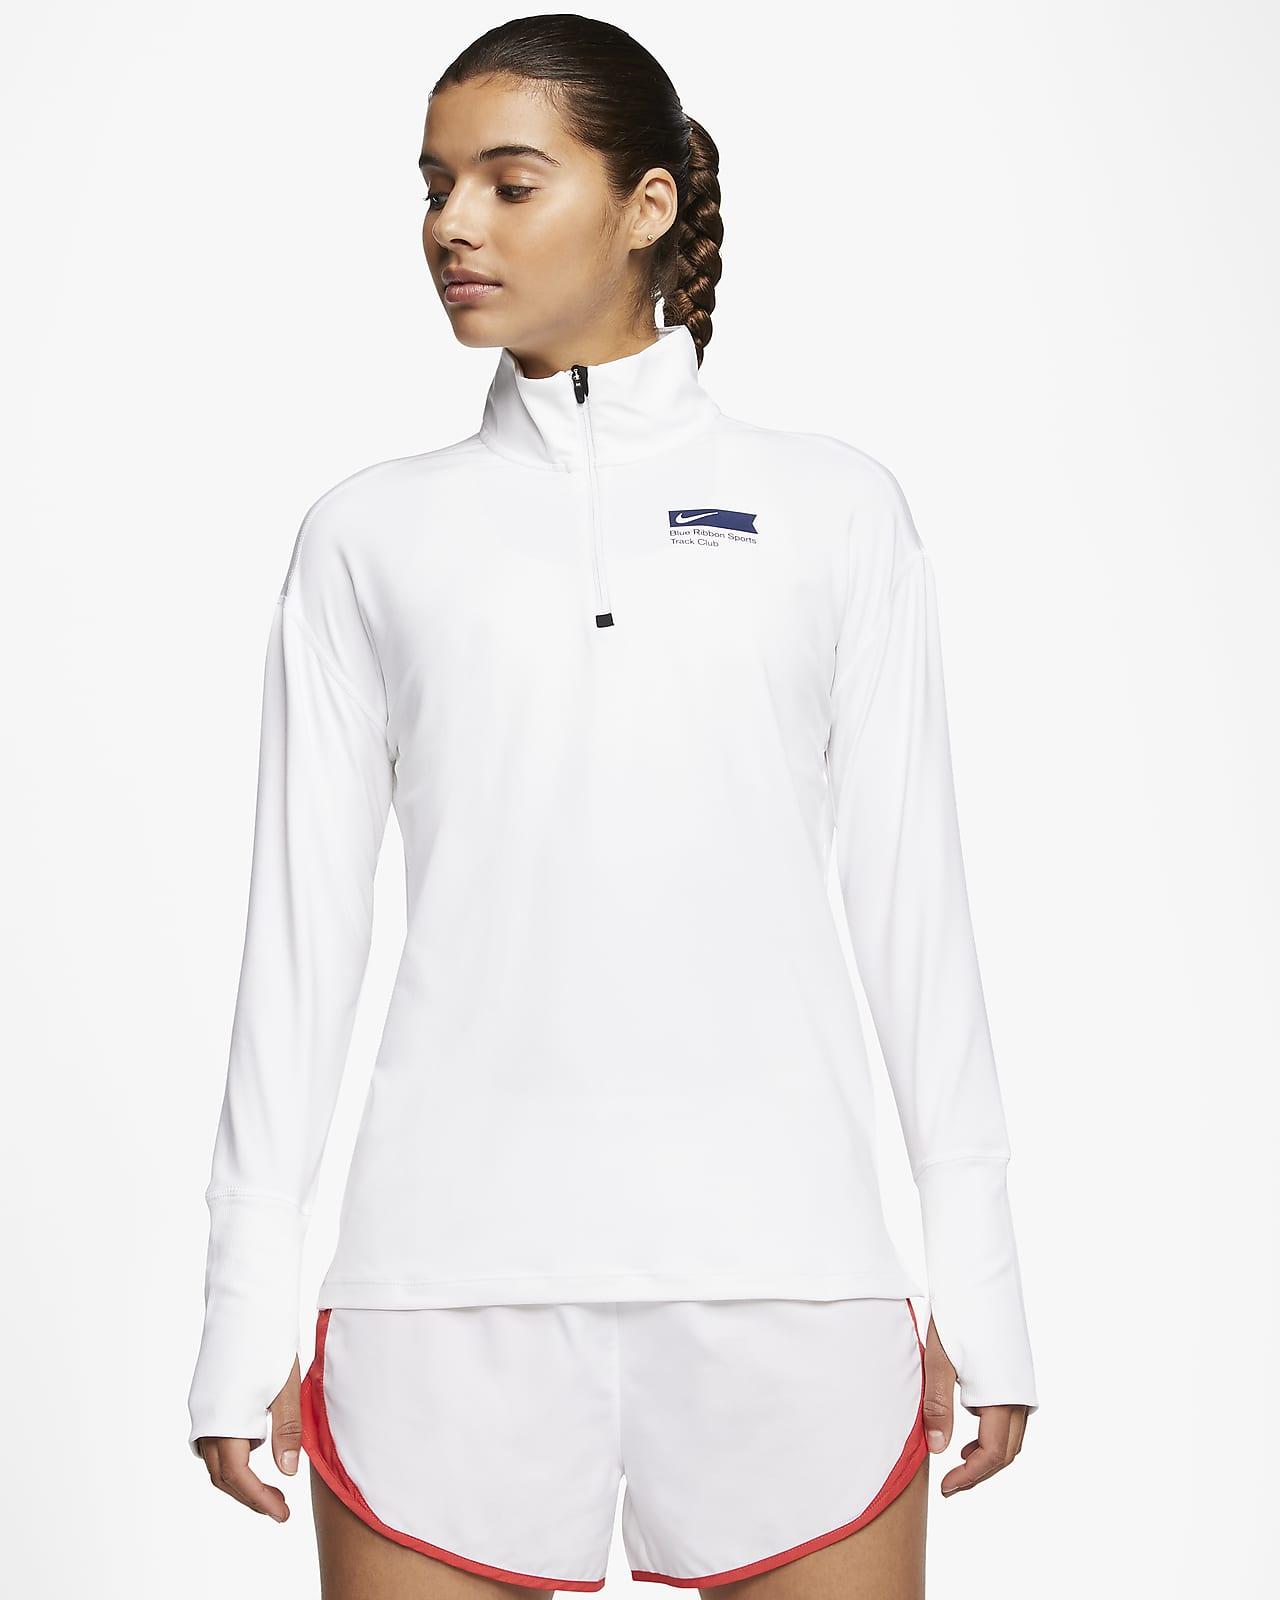 Nike Element Blue Ribbon Sports Women's 1/2-Zip Running Top